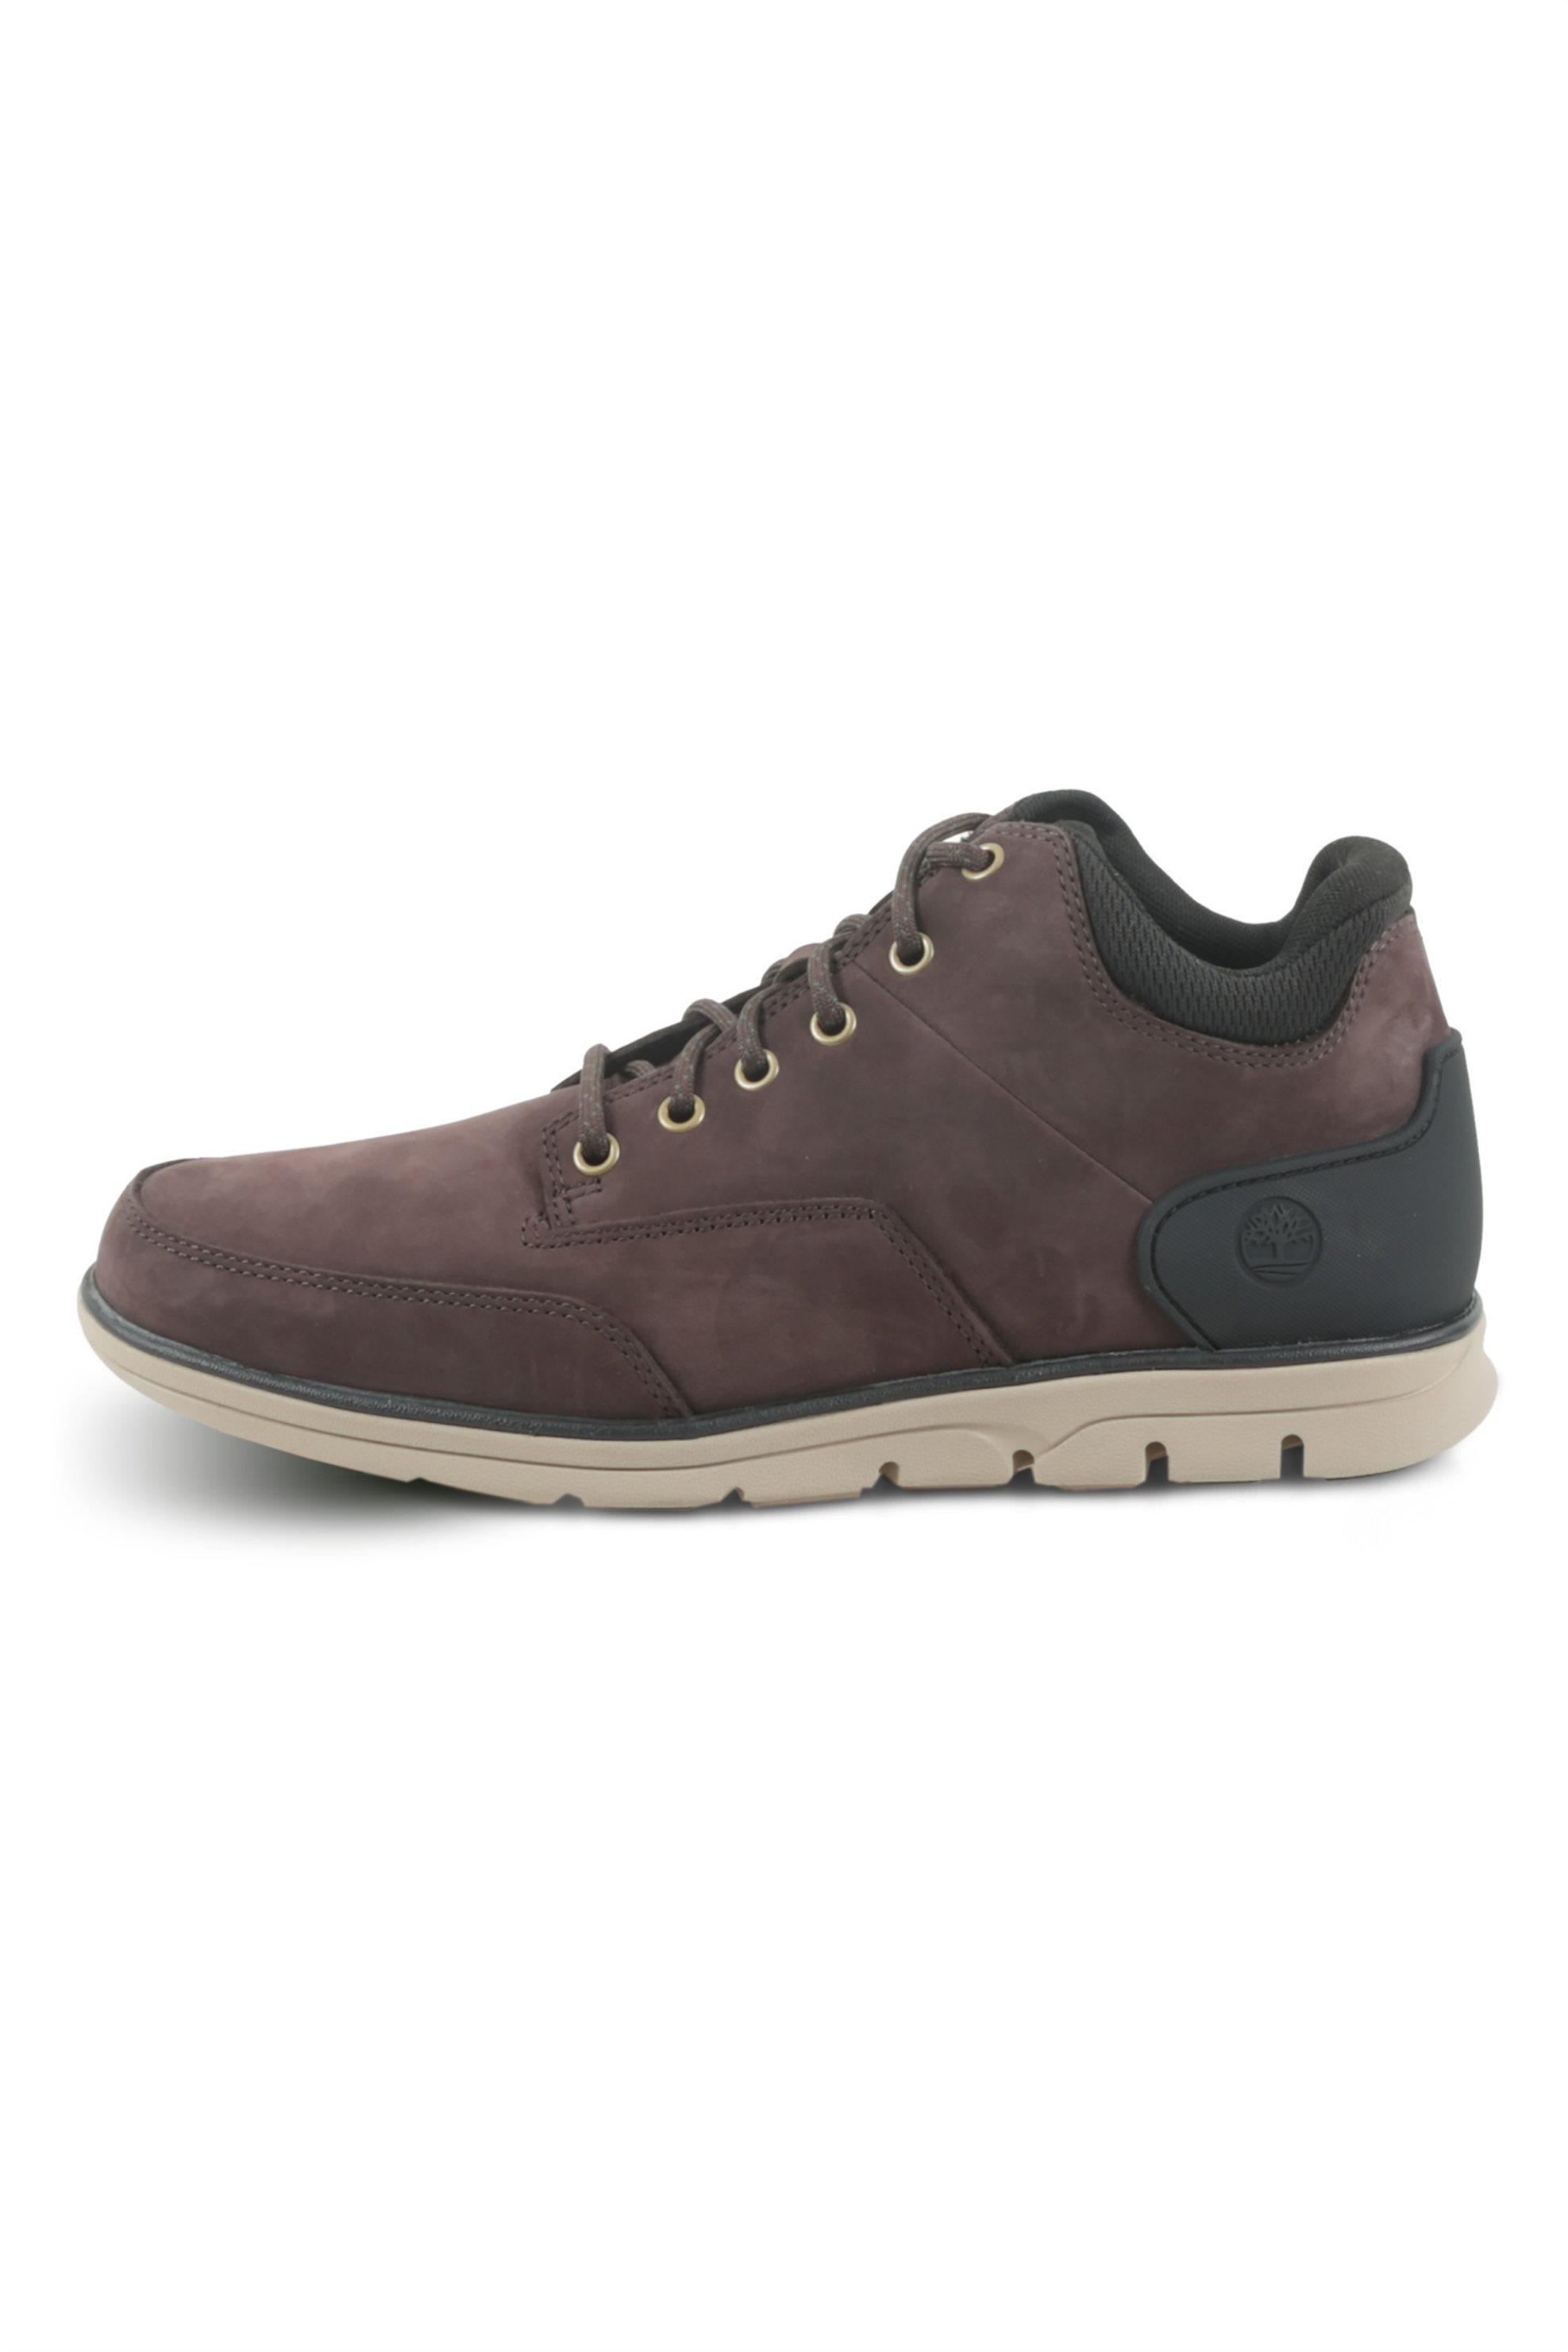 Timberland ανδρικά μποτάκια με κορδόνια «Bradstree Chukka With Molded Heel» – TB0A27KE5441 – Καφέ